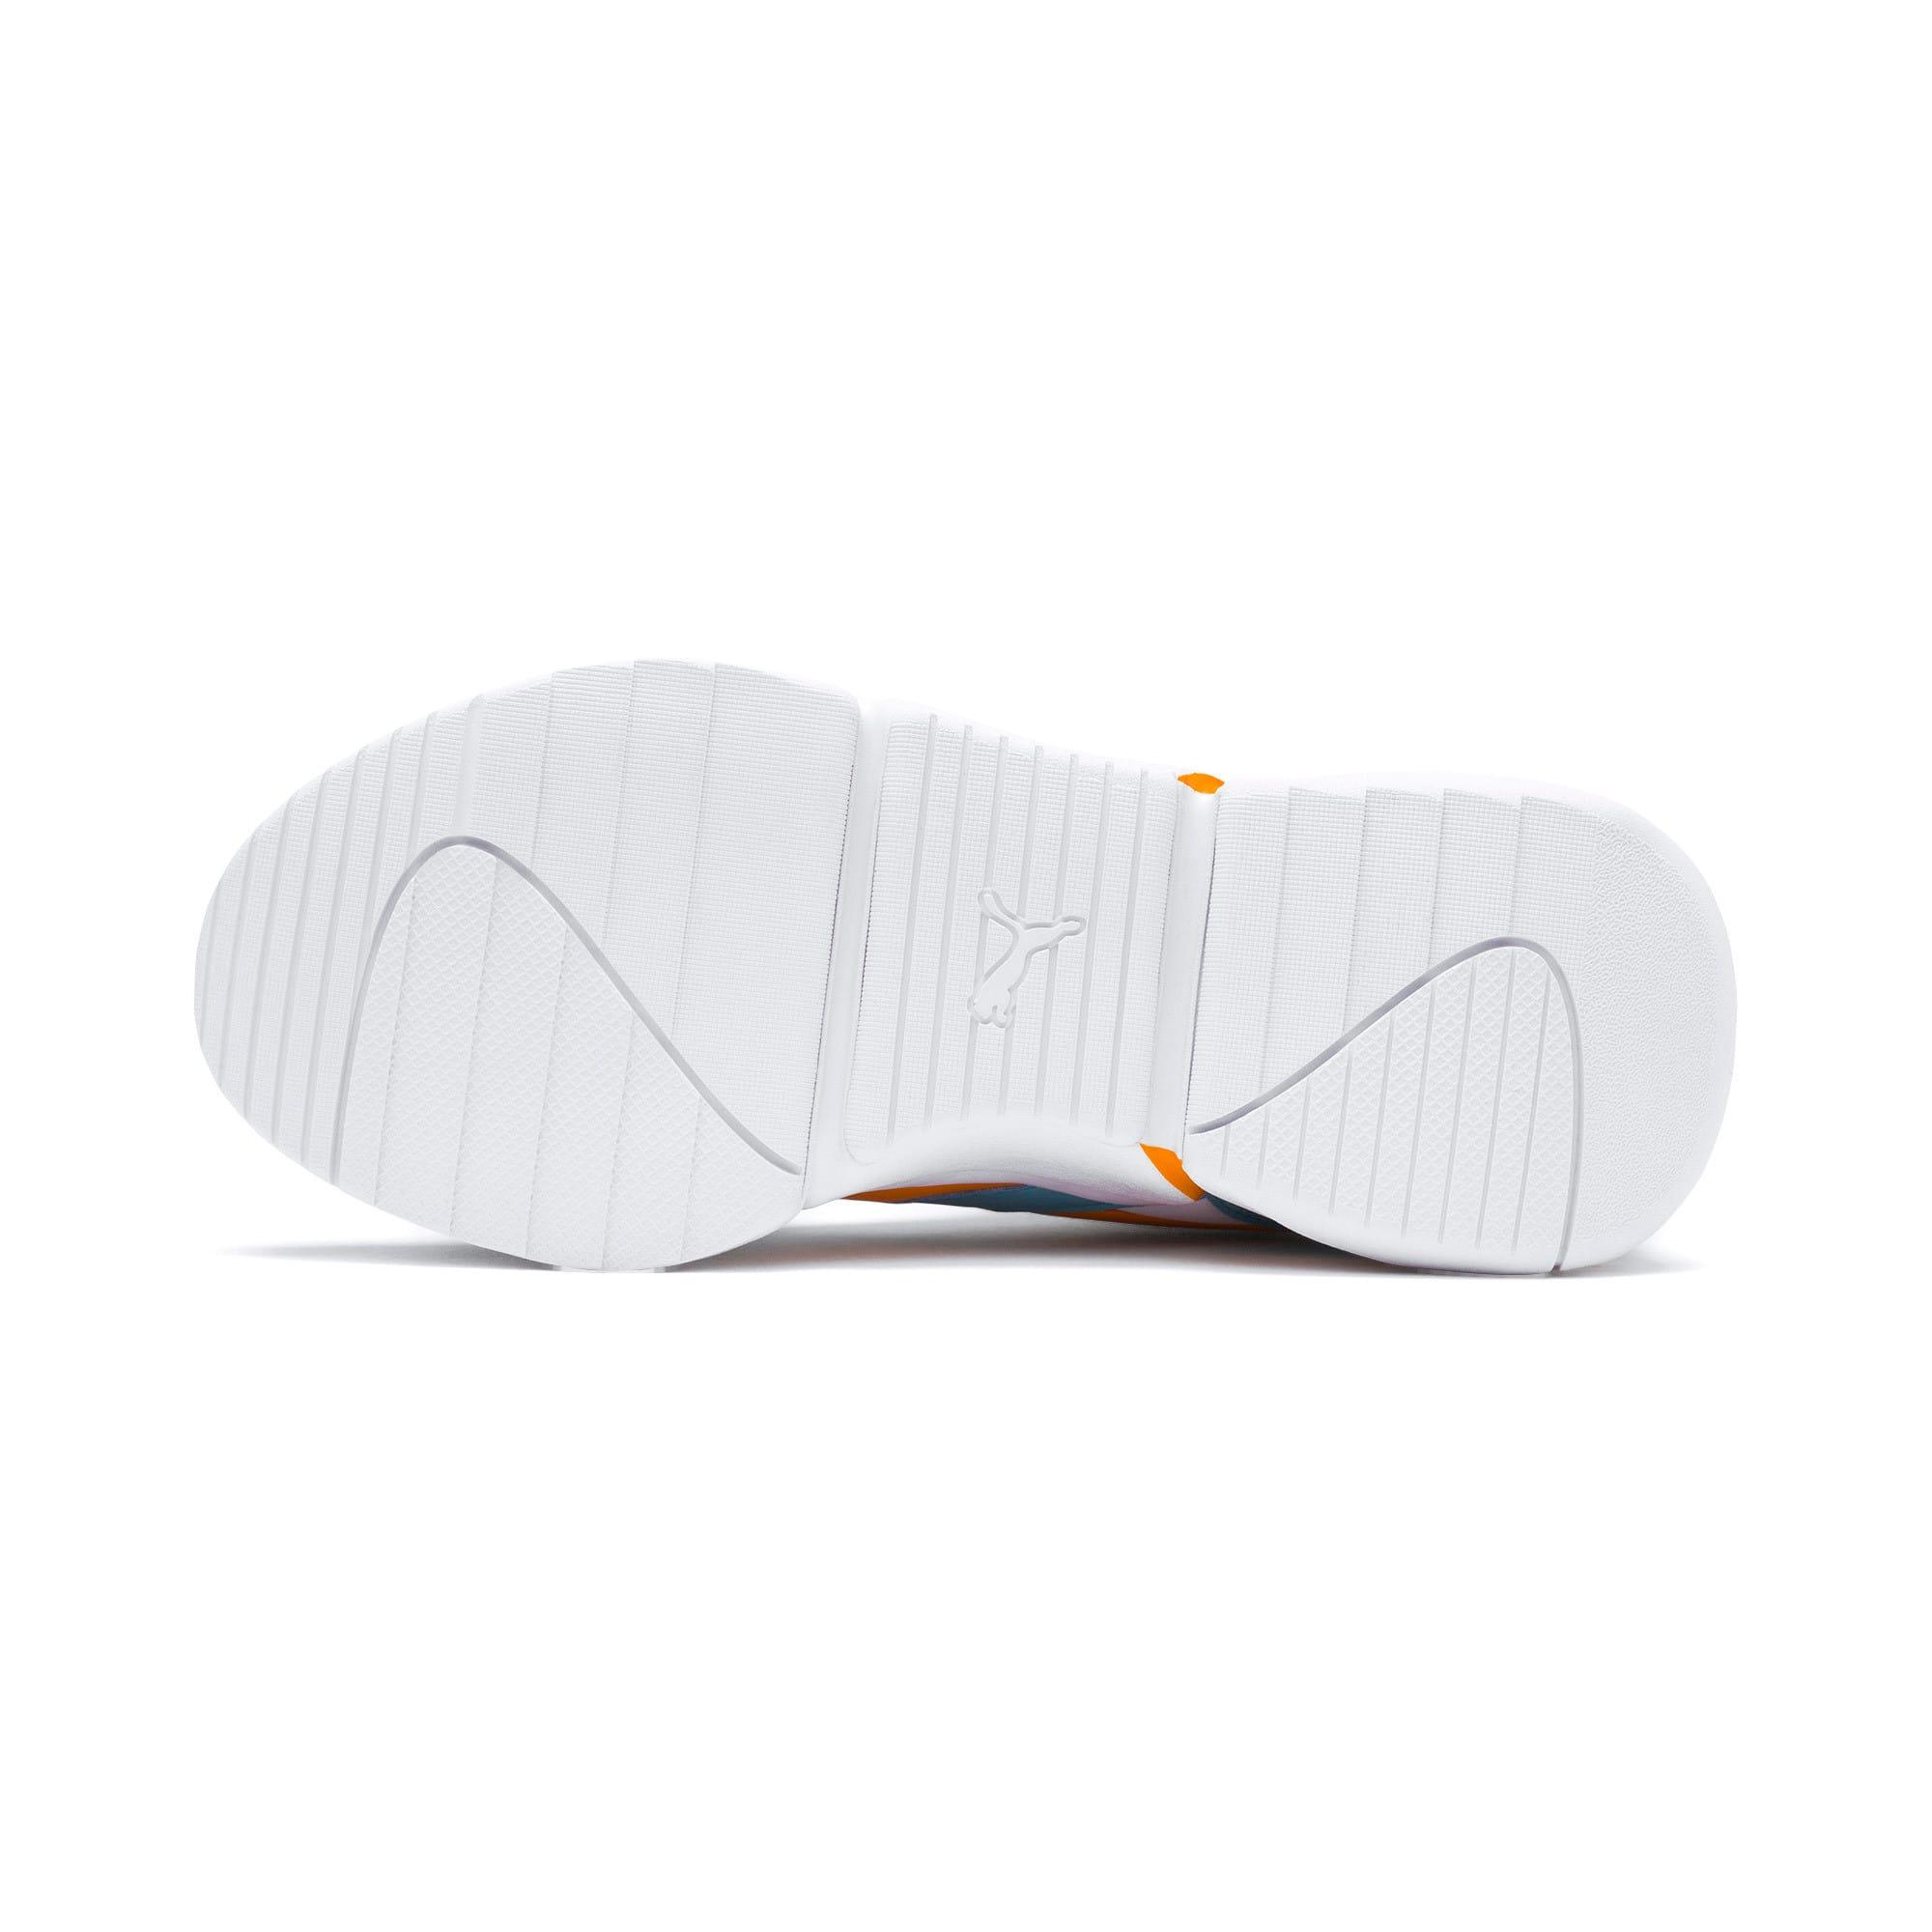 Thumbnail 5 of Nova Women's Sneakers, Puma White-Milky Blue, medium